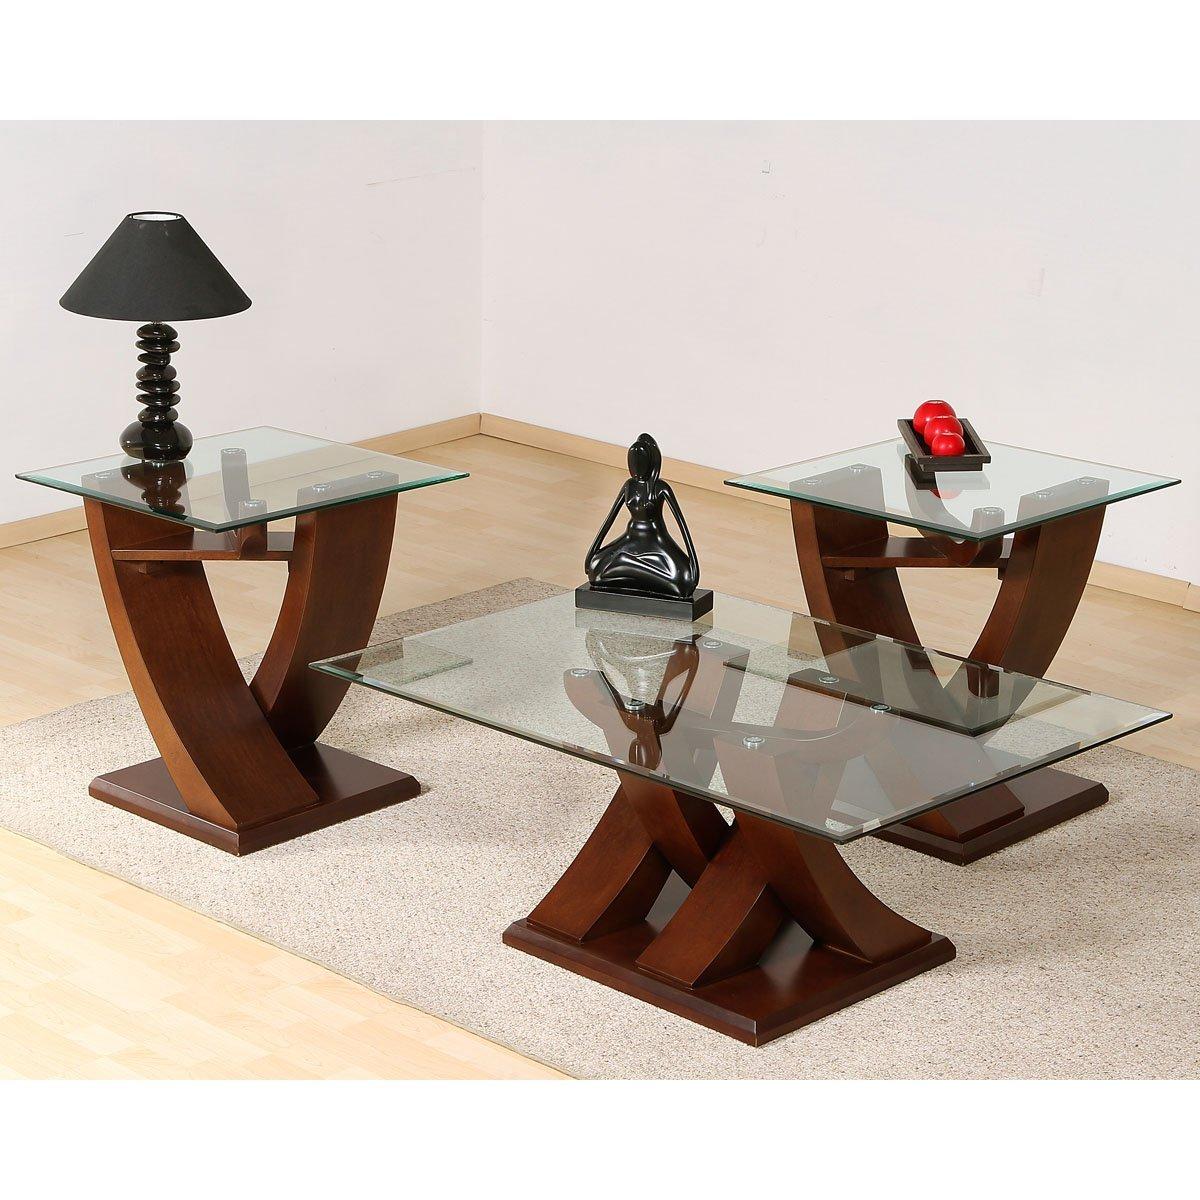 Mesa lateral siria para sala sears com mx me entiende for Mesas para muebles modernas